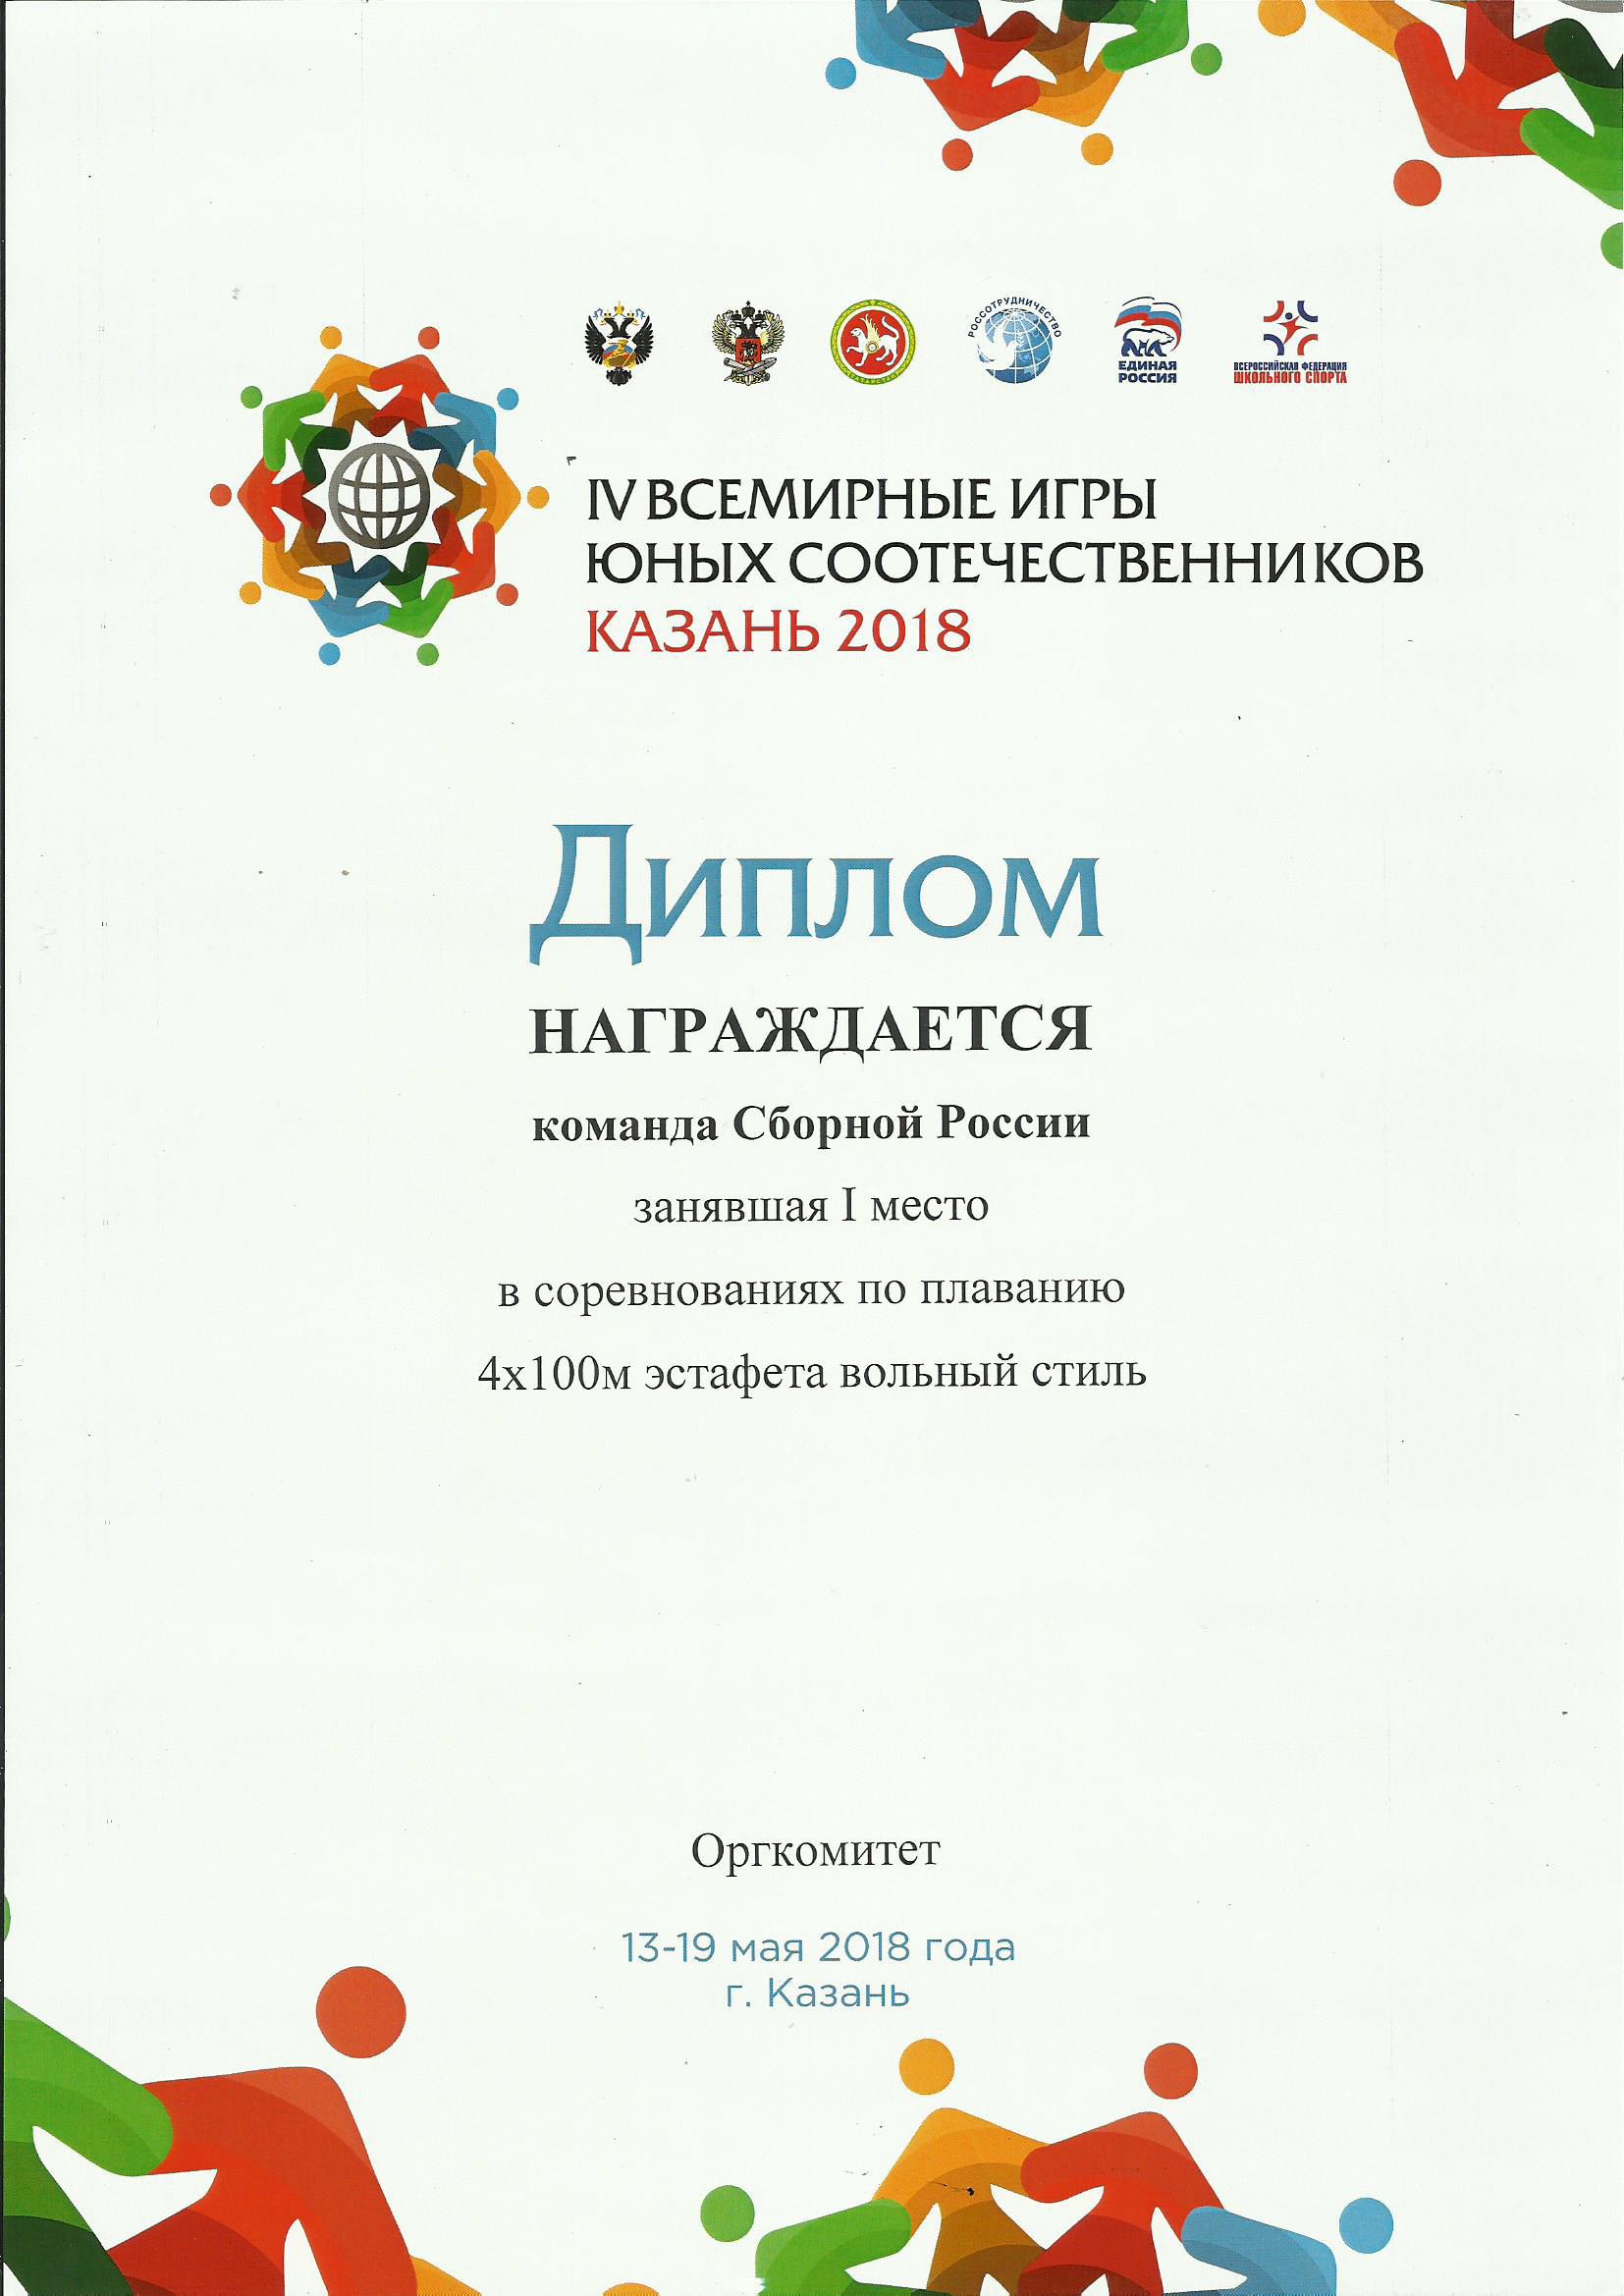 https://dlpp.ru/wp-content/uploads/2019/11/диплом-3-1.jpg